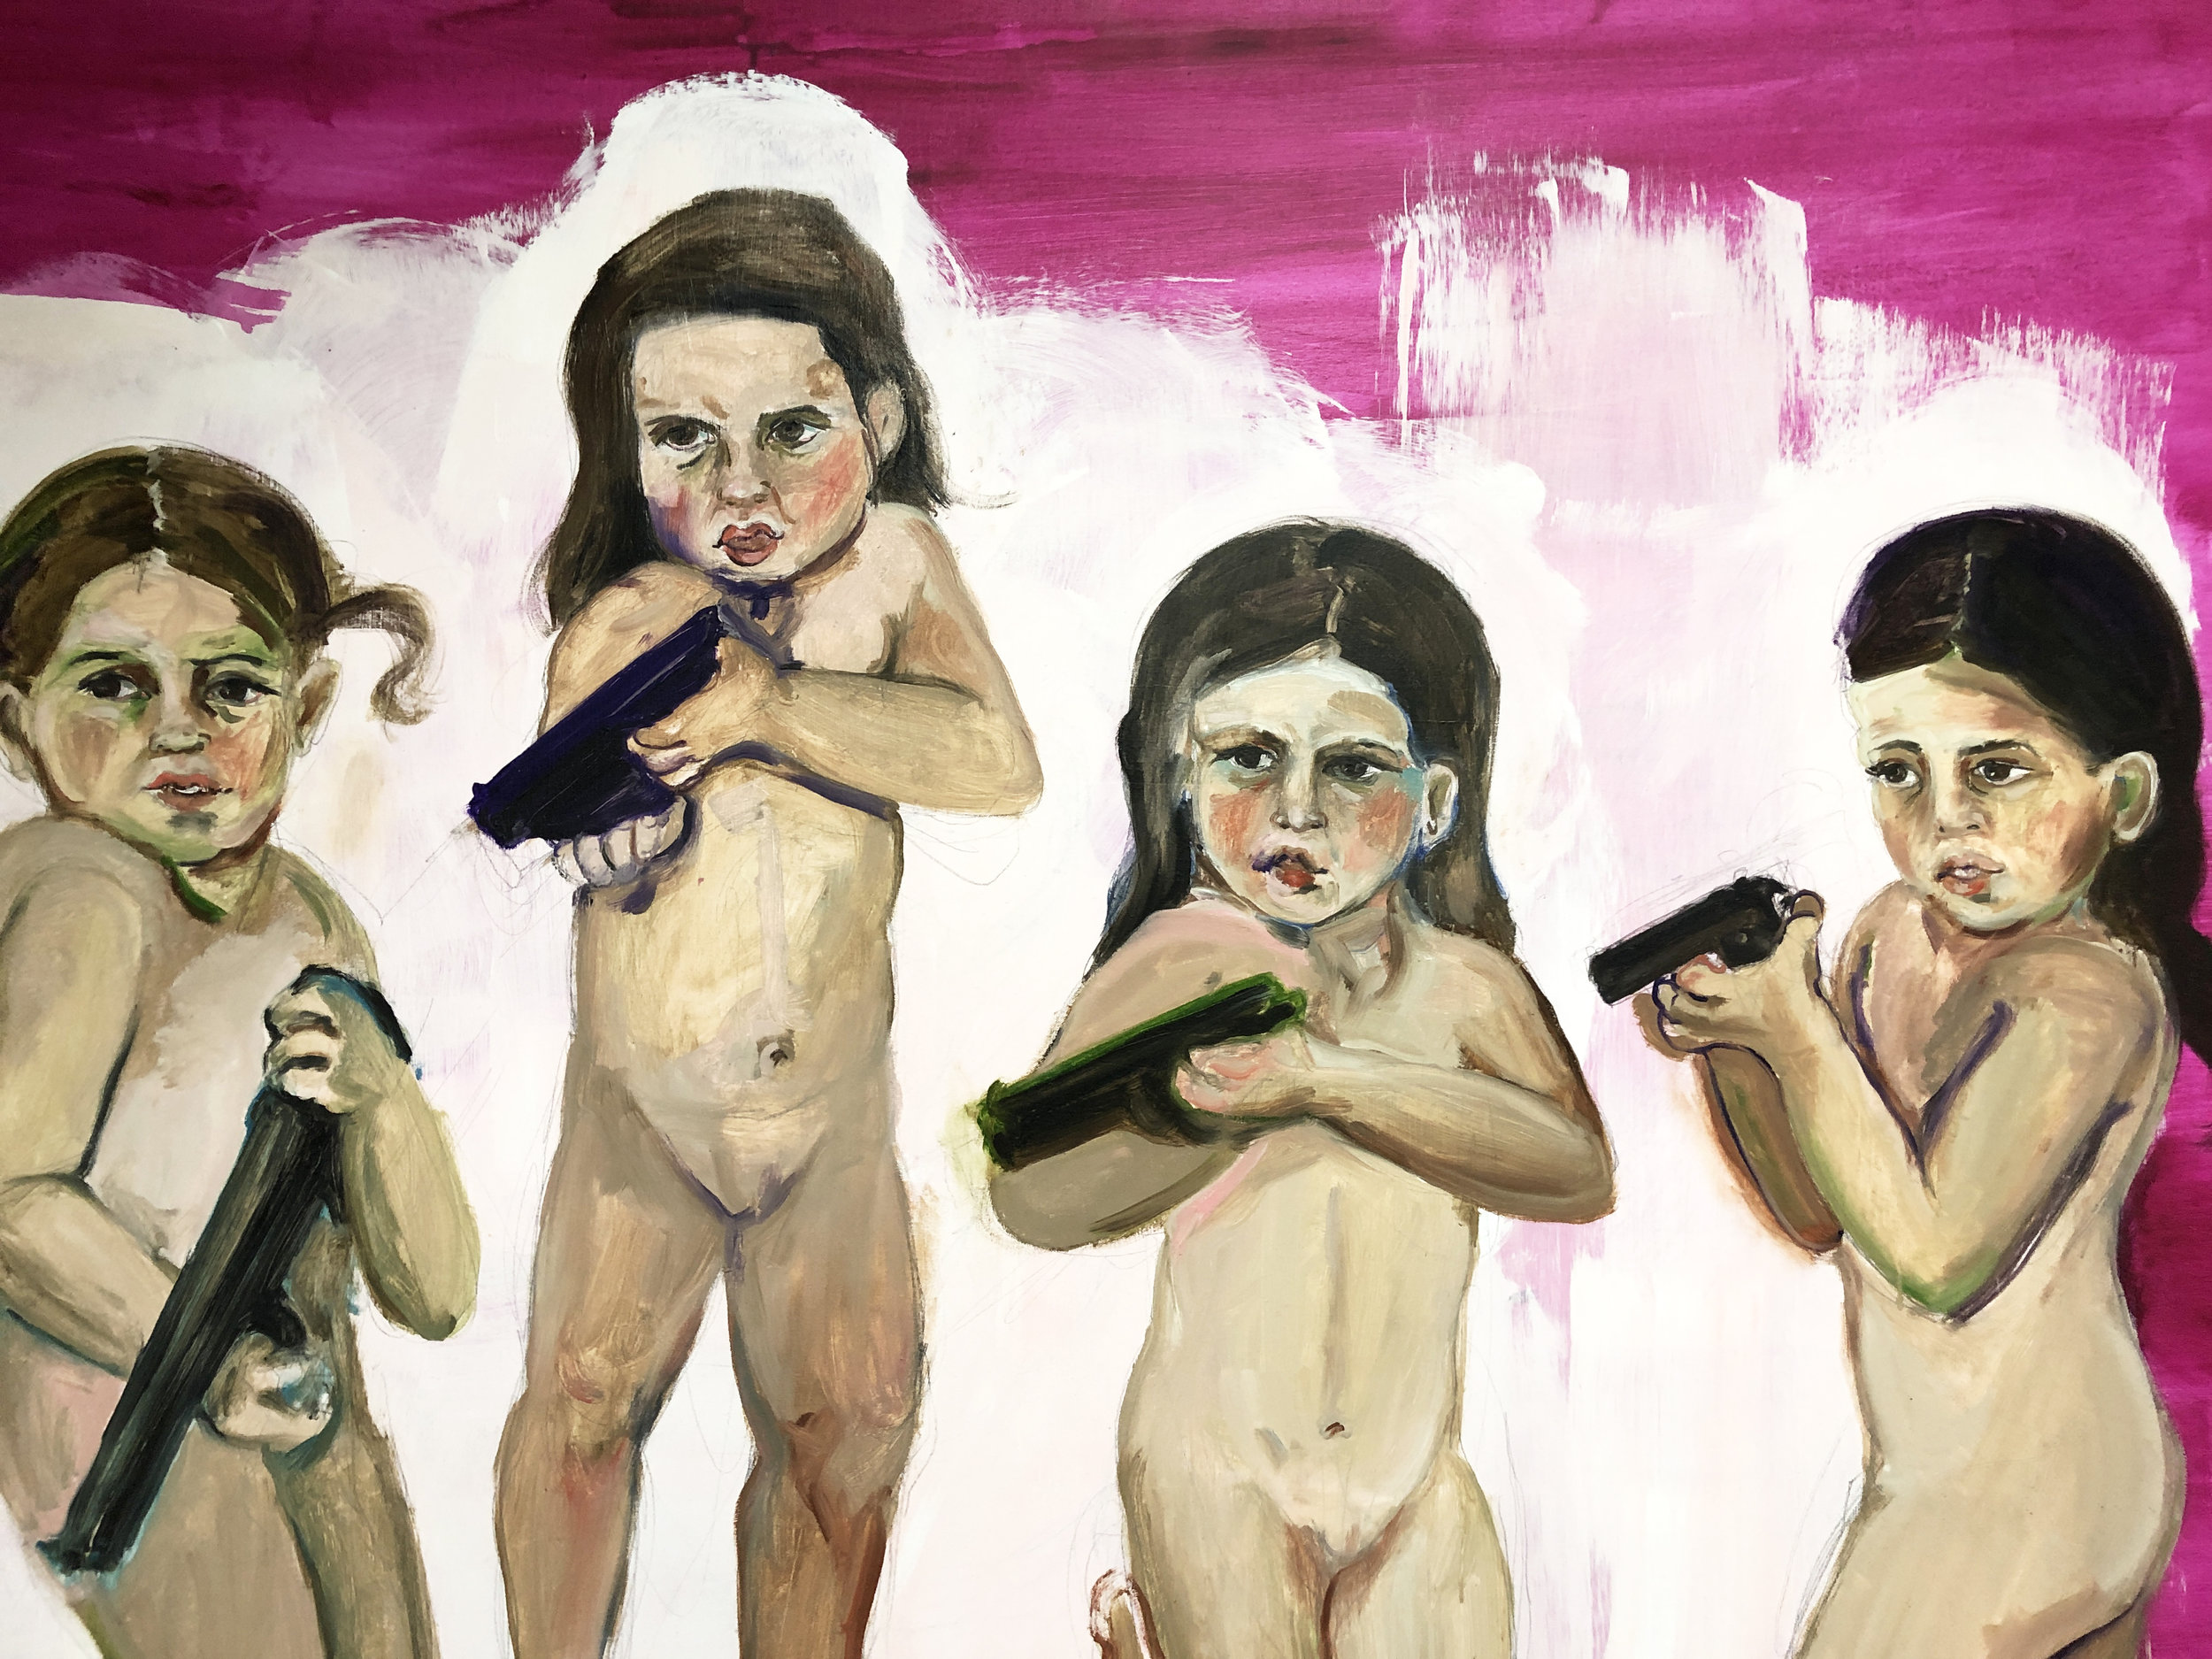 Chicas Pistoleras (detail), 2012, Oil on canvas, 65 x 70 in.